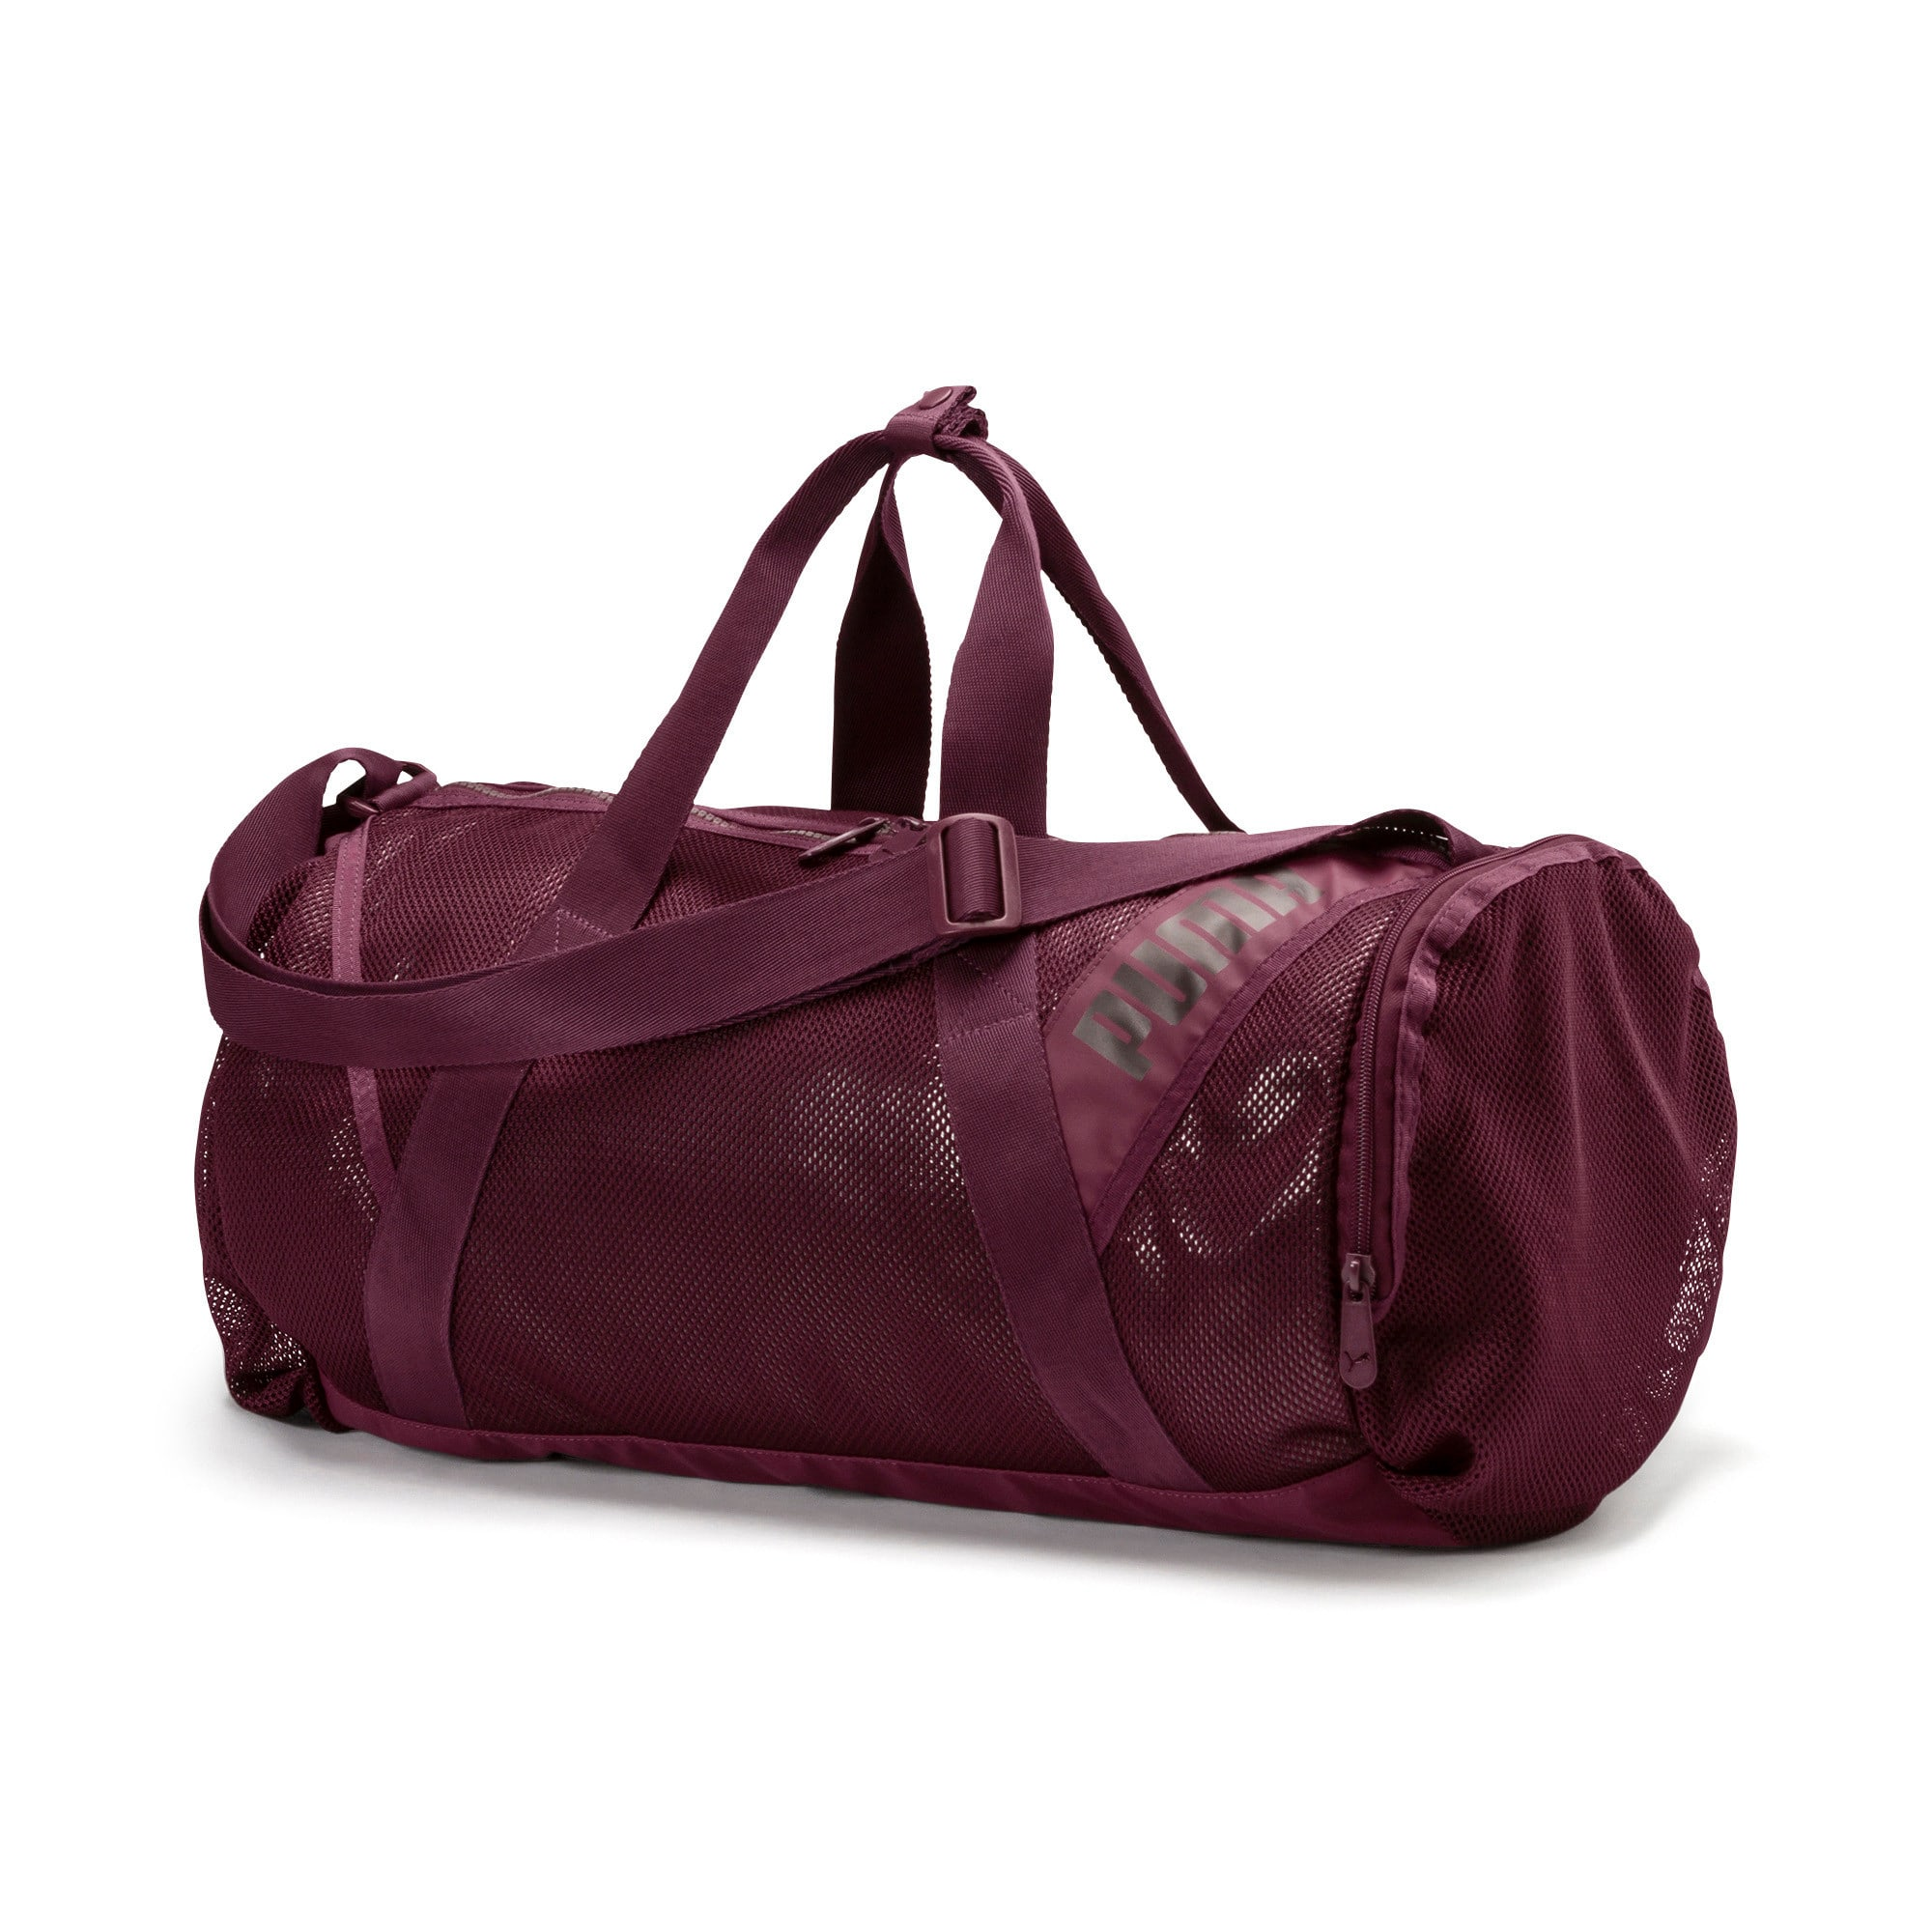 Thumbnail 1 of Ambition Women's Barrel Bag, Fig-Bronze-metallic, medium